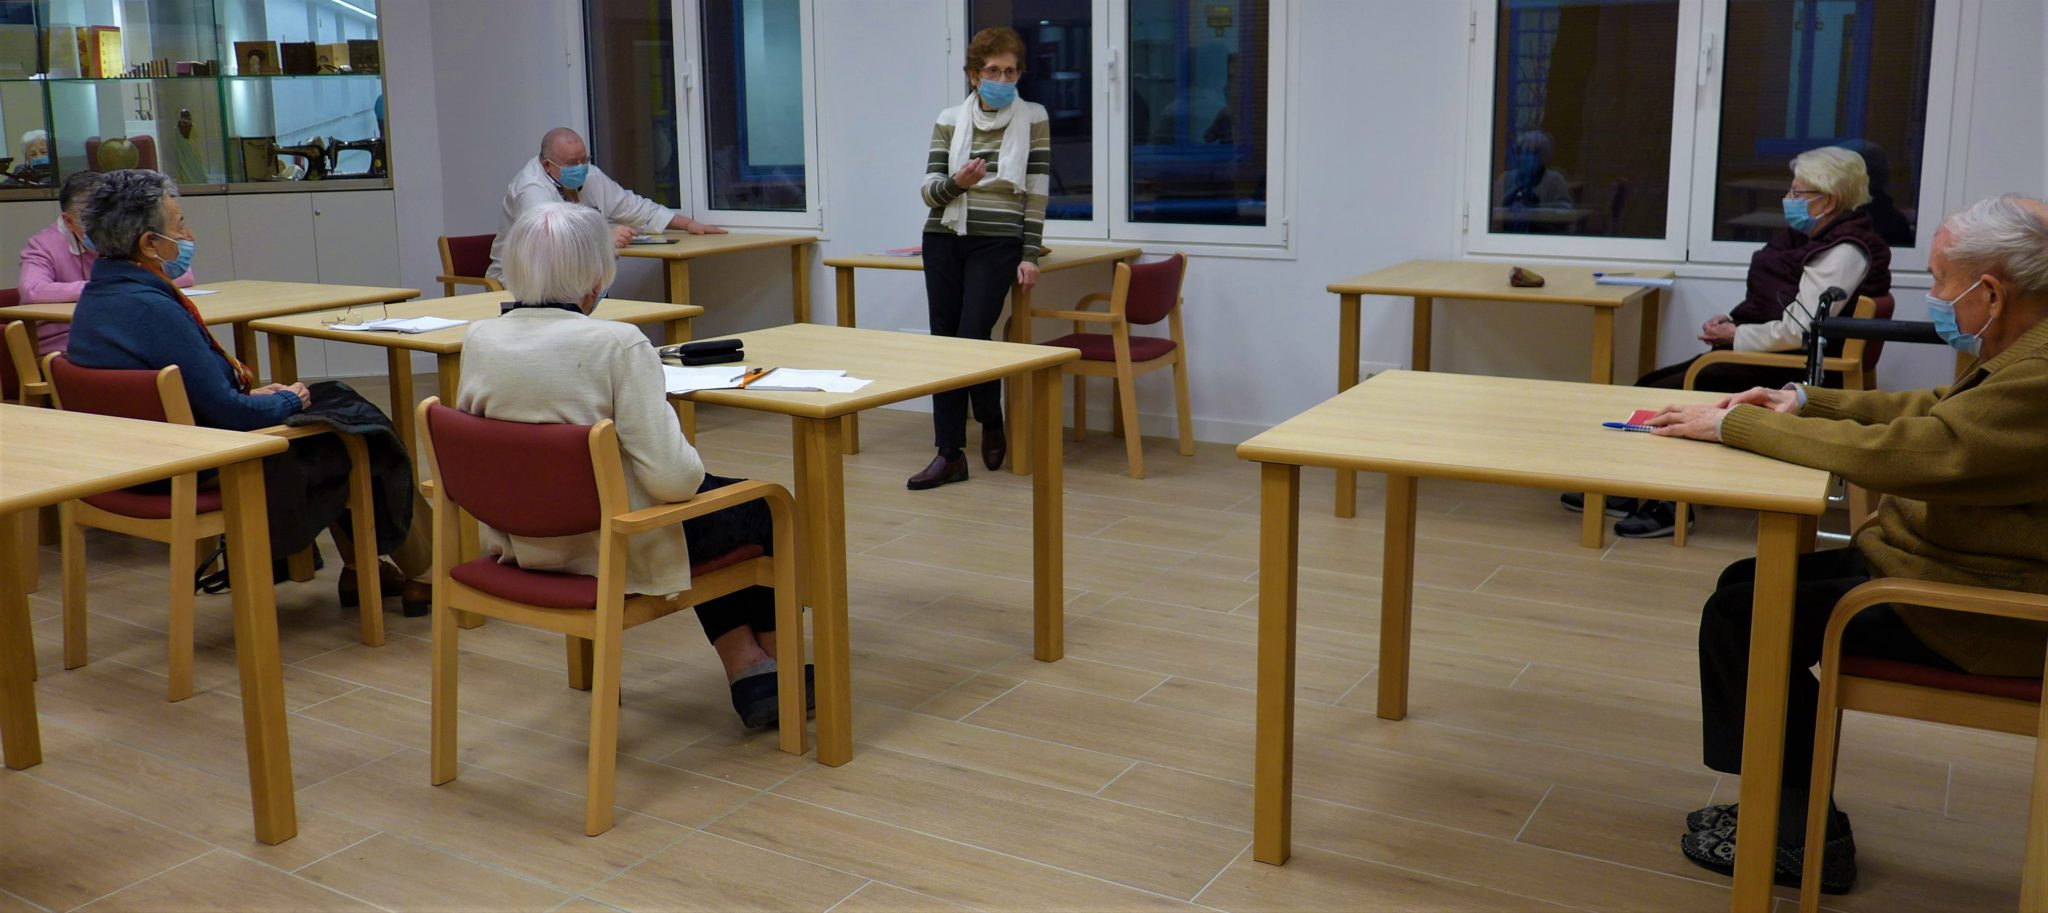 Participantes en el taller de escritura creativa